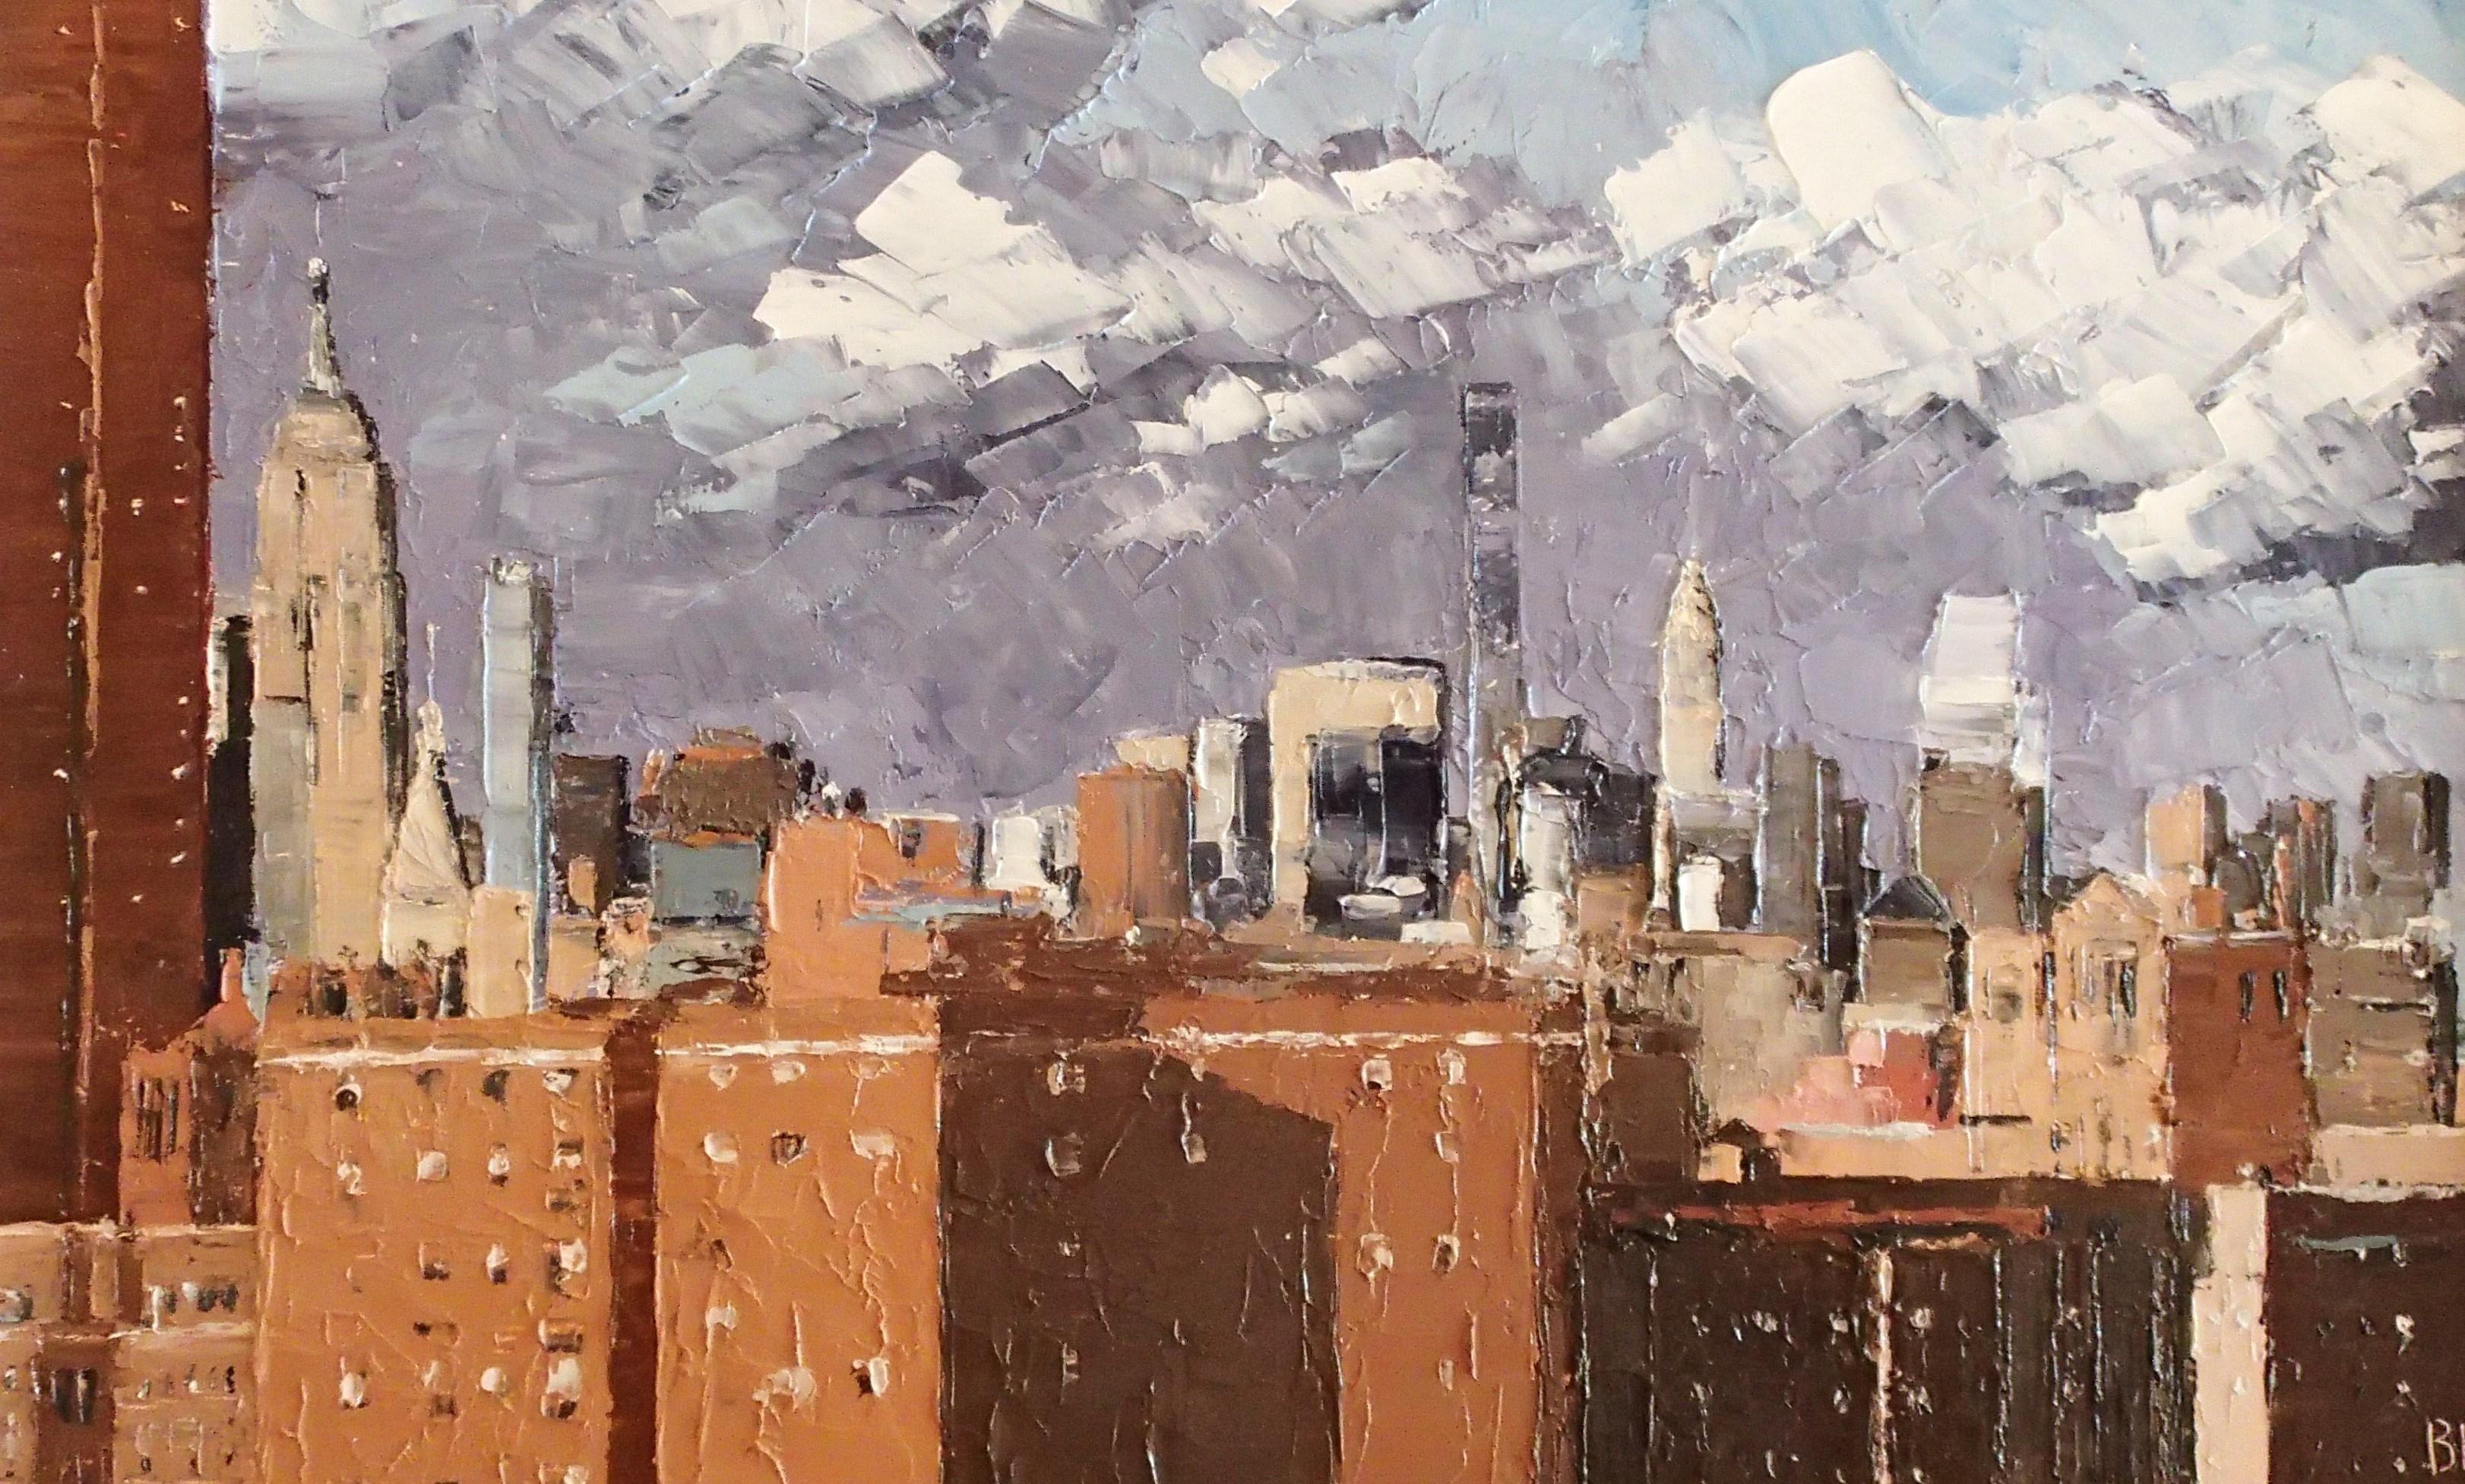 After rain, New York City